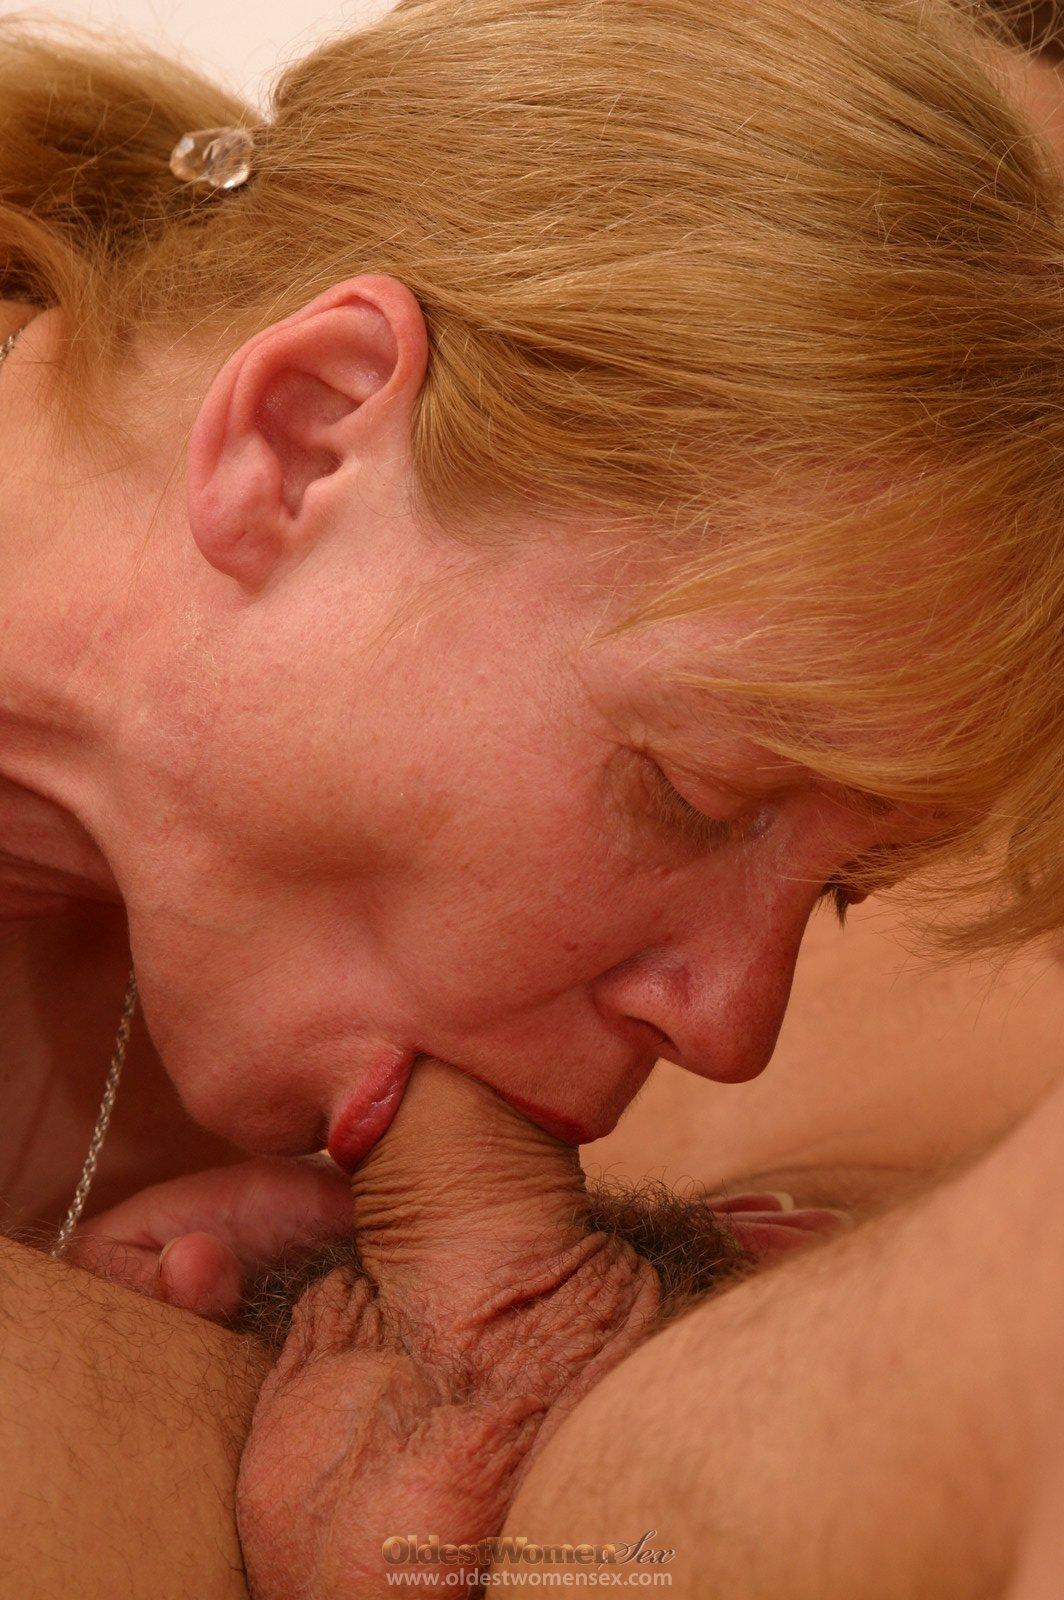 Секс мамочки с мальчиками онлайн 10 фотография